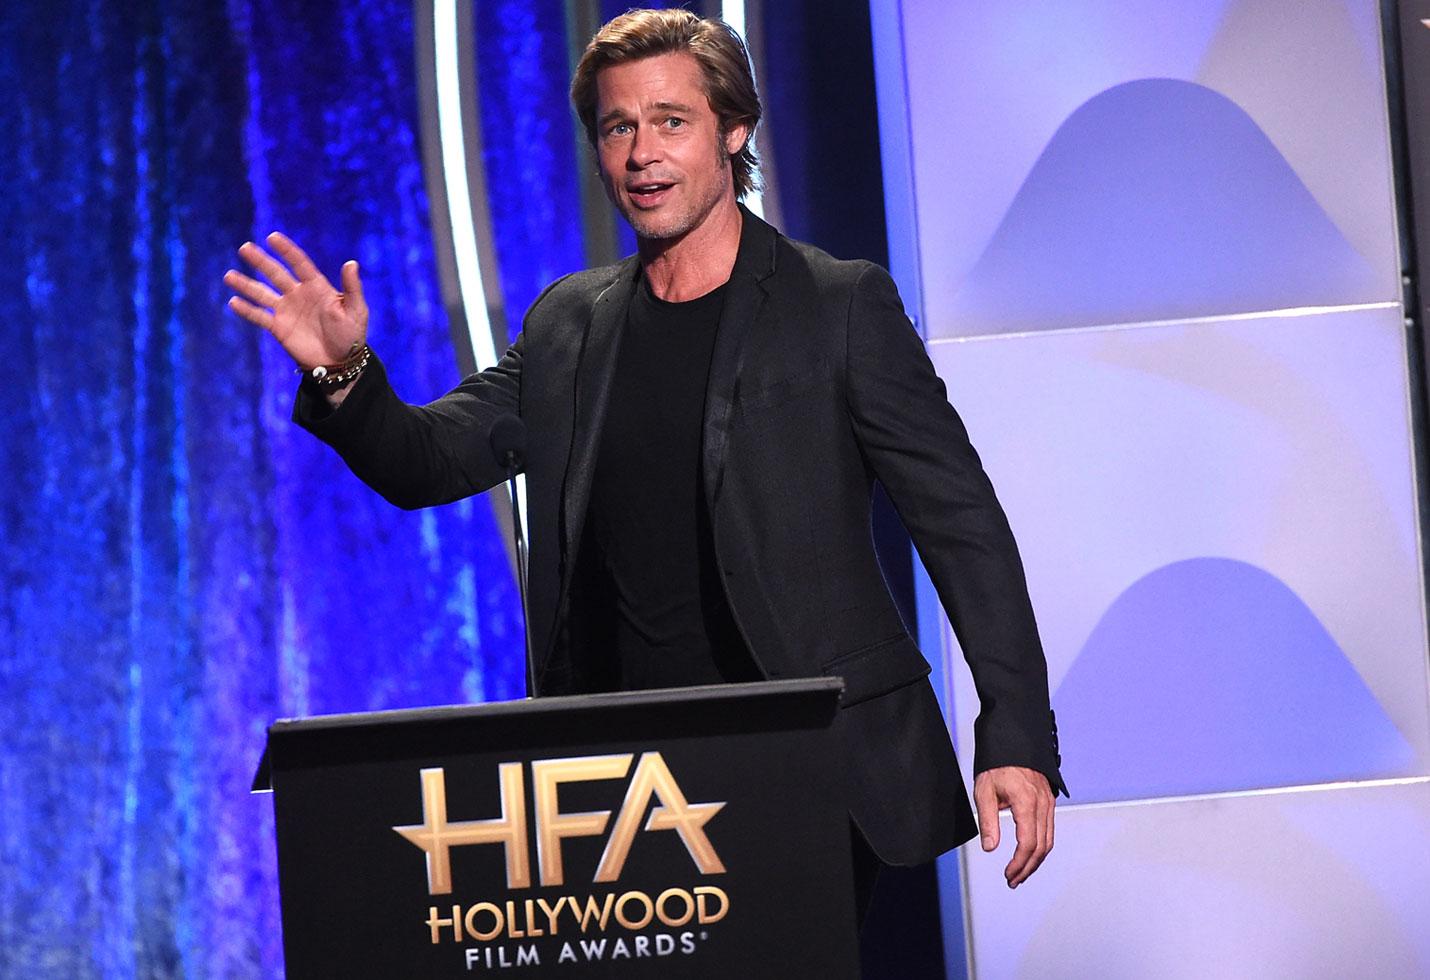 Brad Pitt Long Hair Hollywood Film Awards Angelina Jolie Divorce Kids Custody